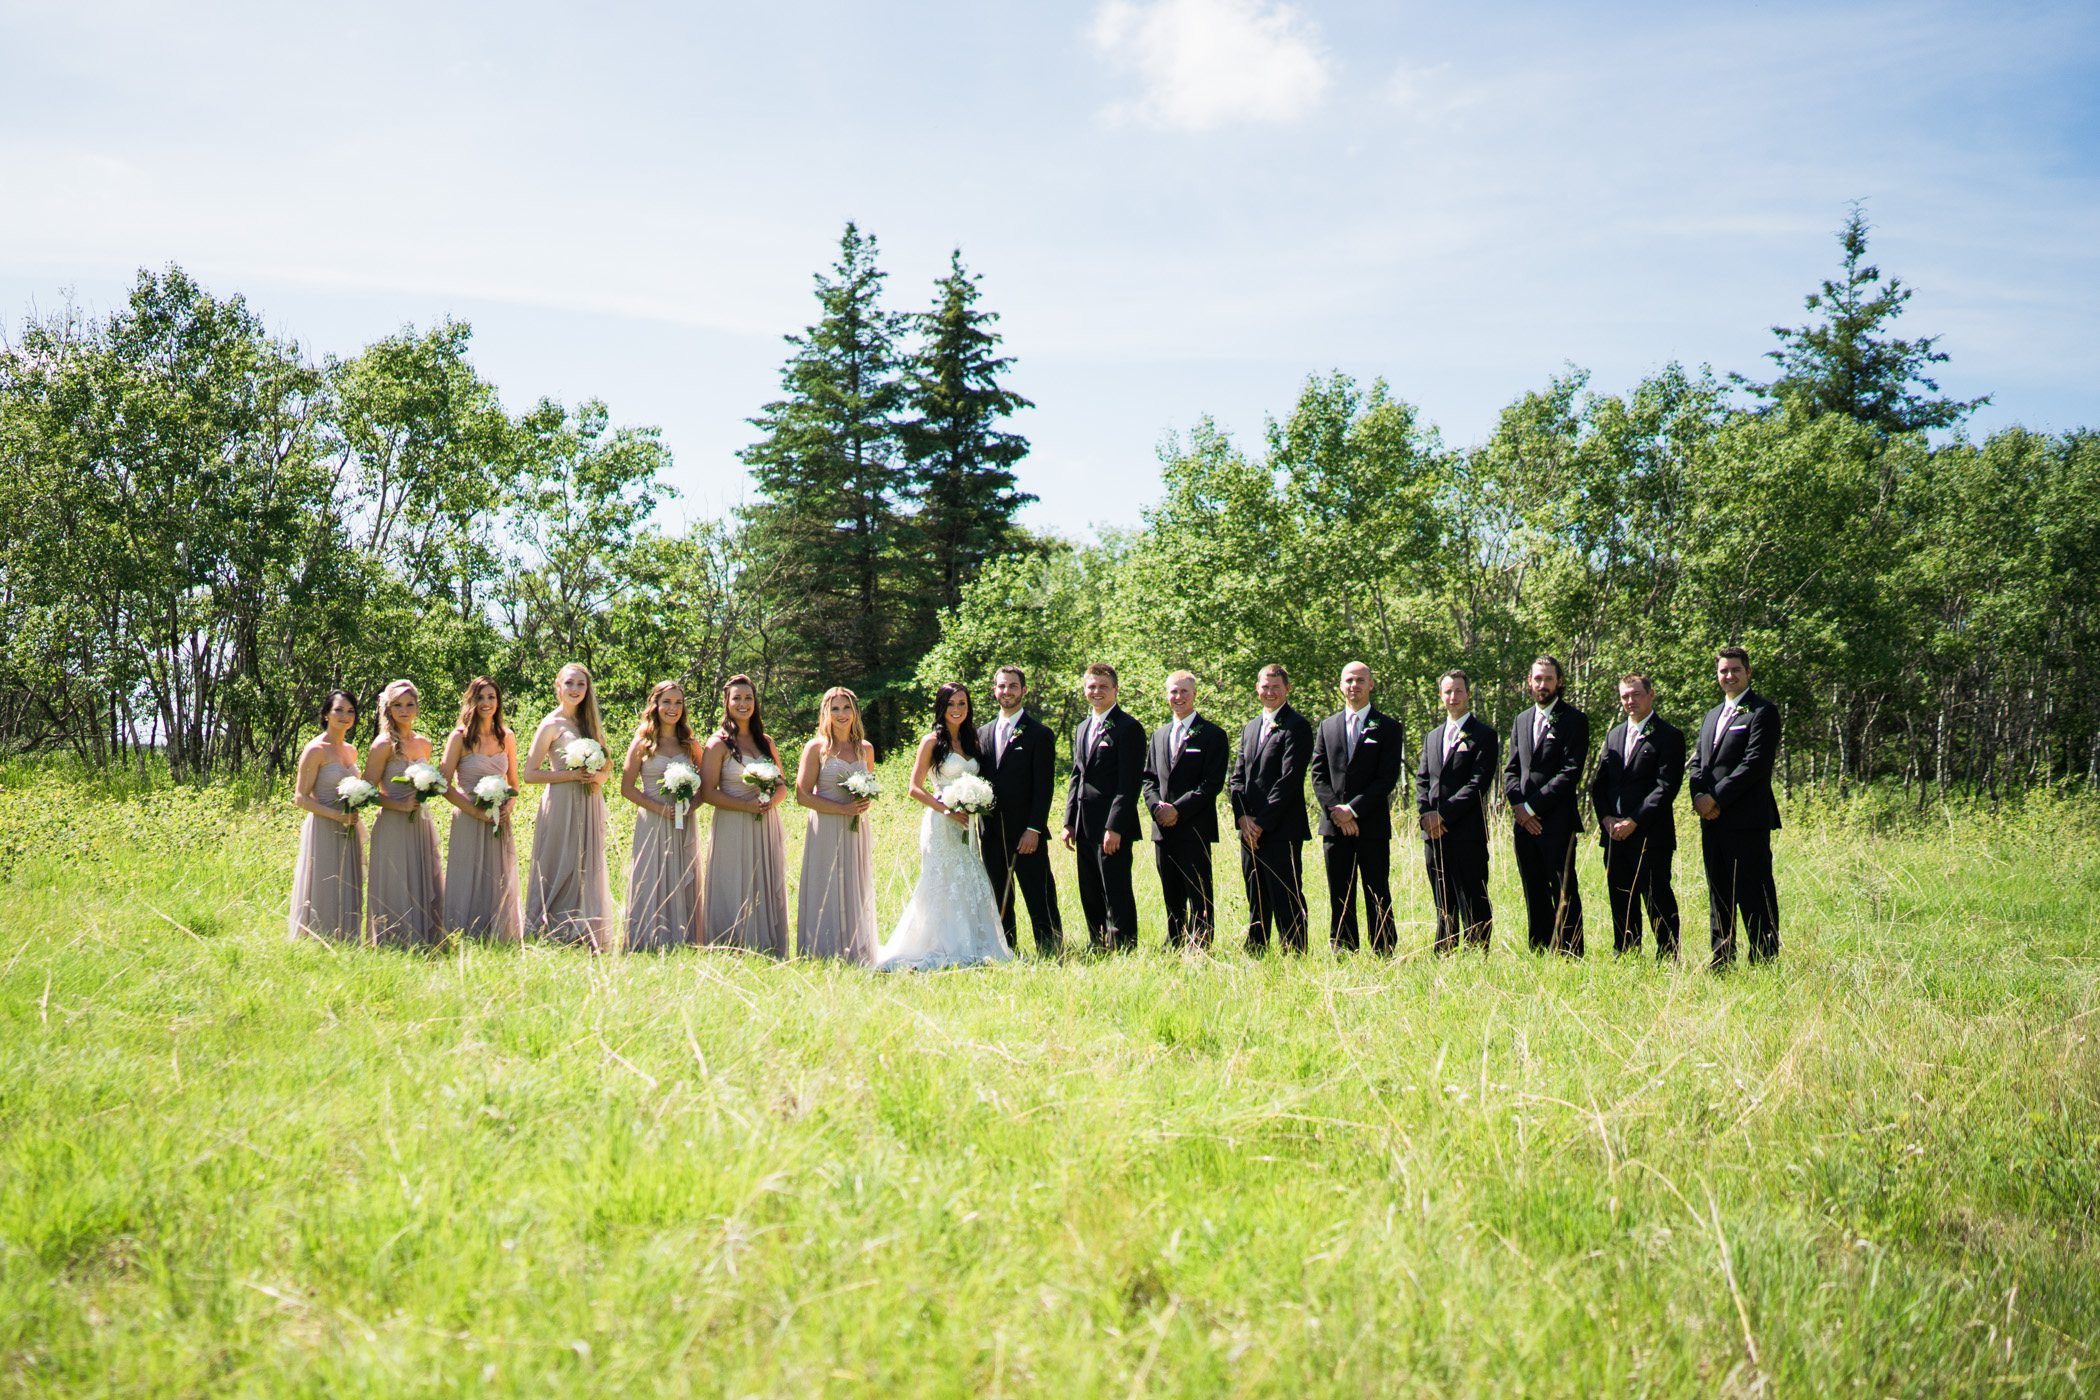 Hillary and Mark - Pineridge Hollow Wedding - Cojo Photo-1155.jpg